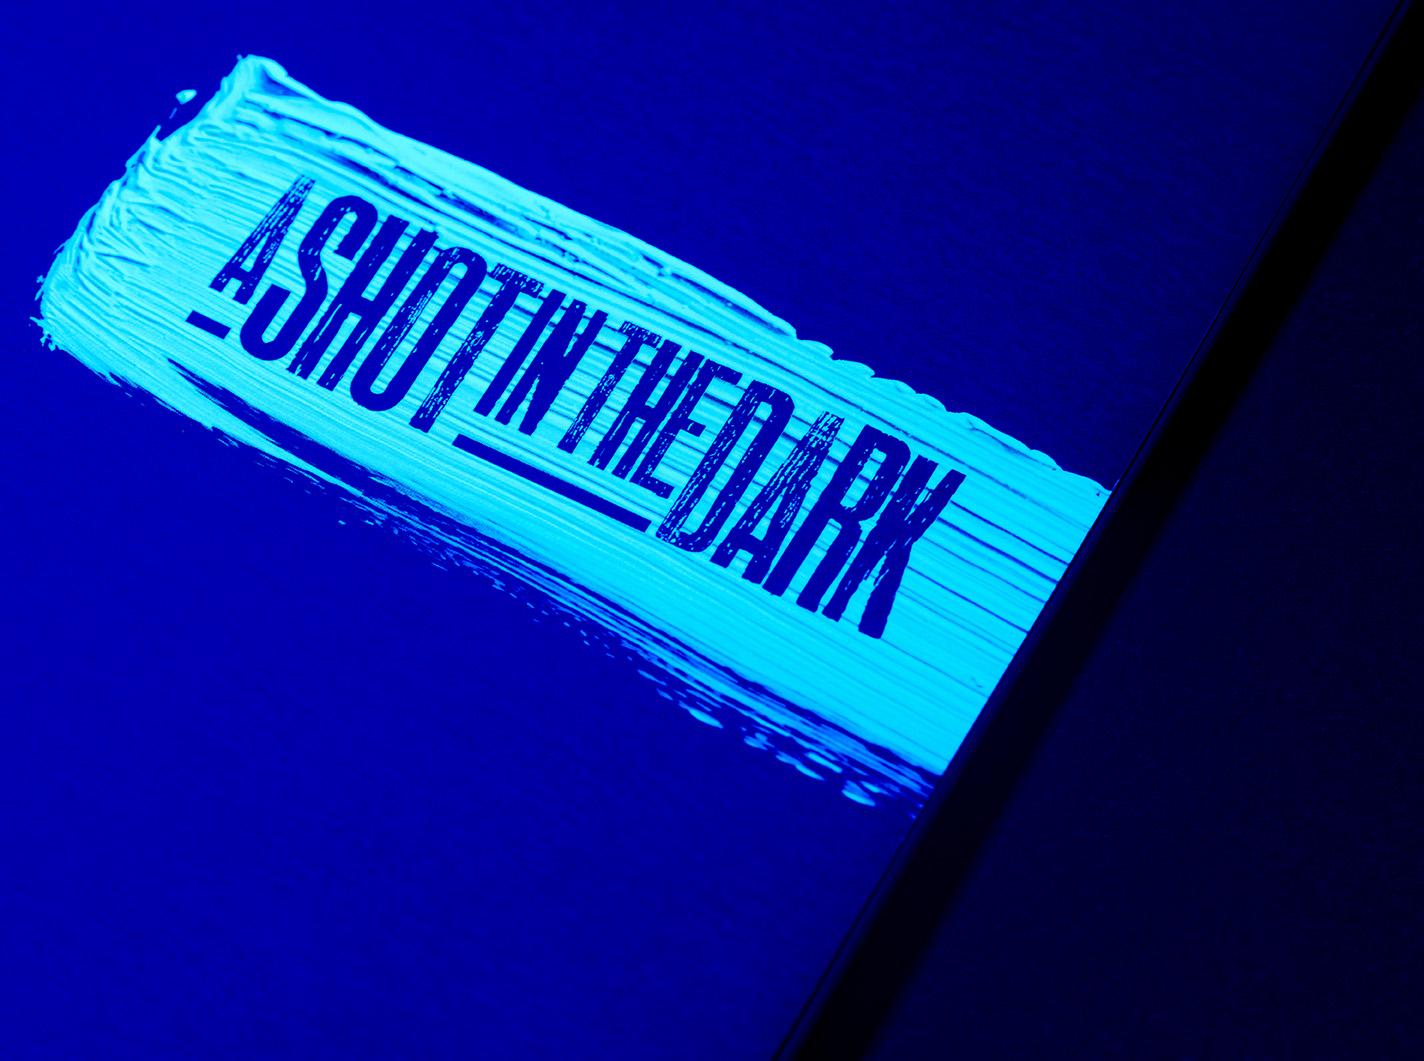 A-SHOT-IN-THE-DARK_36.jpg